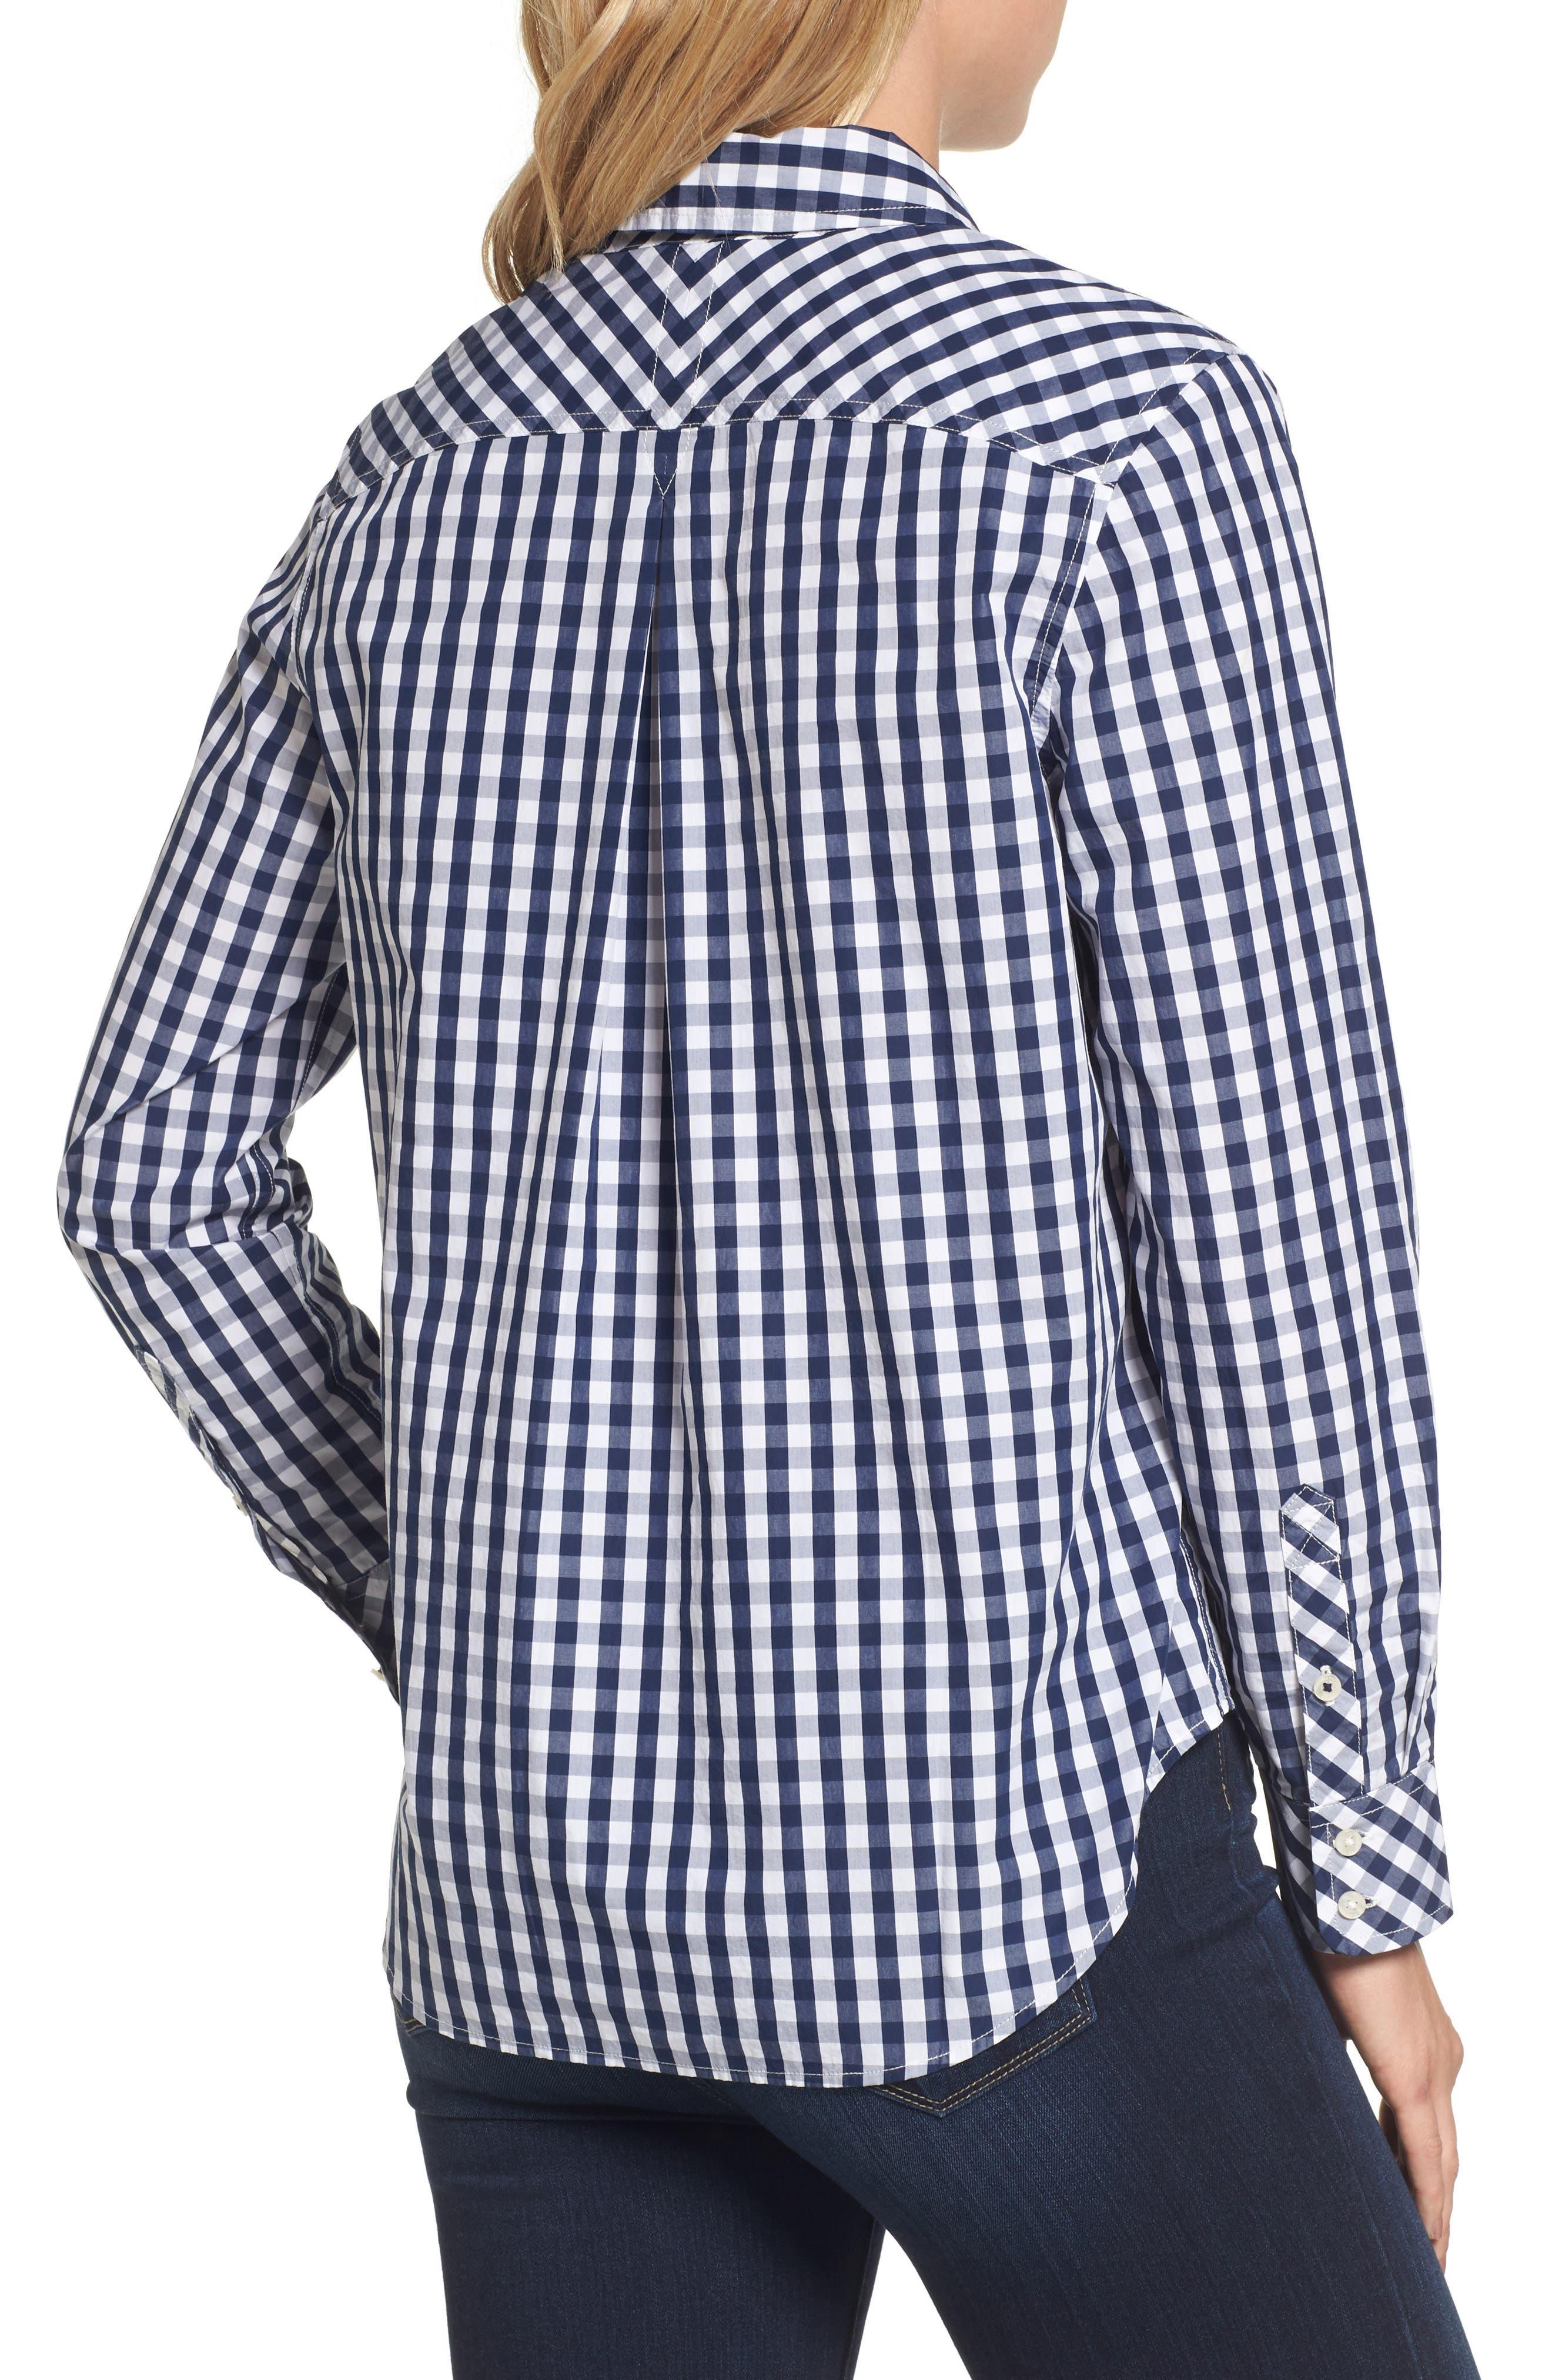 Seabreeze Gingham Pocket Shirt,                             Alternate thumbnail 2, color,                             Deep Bay